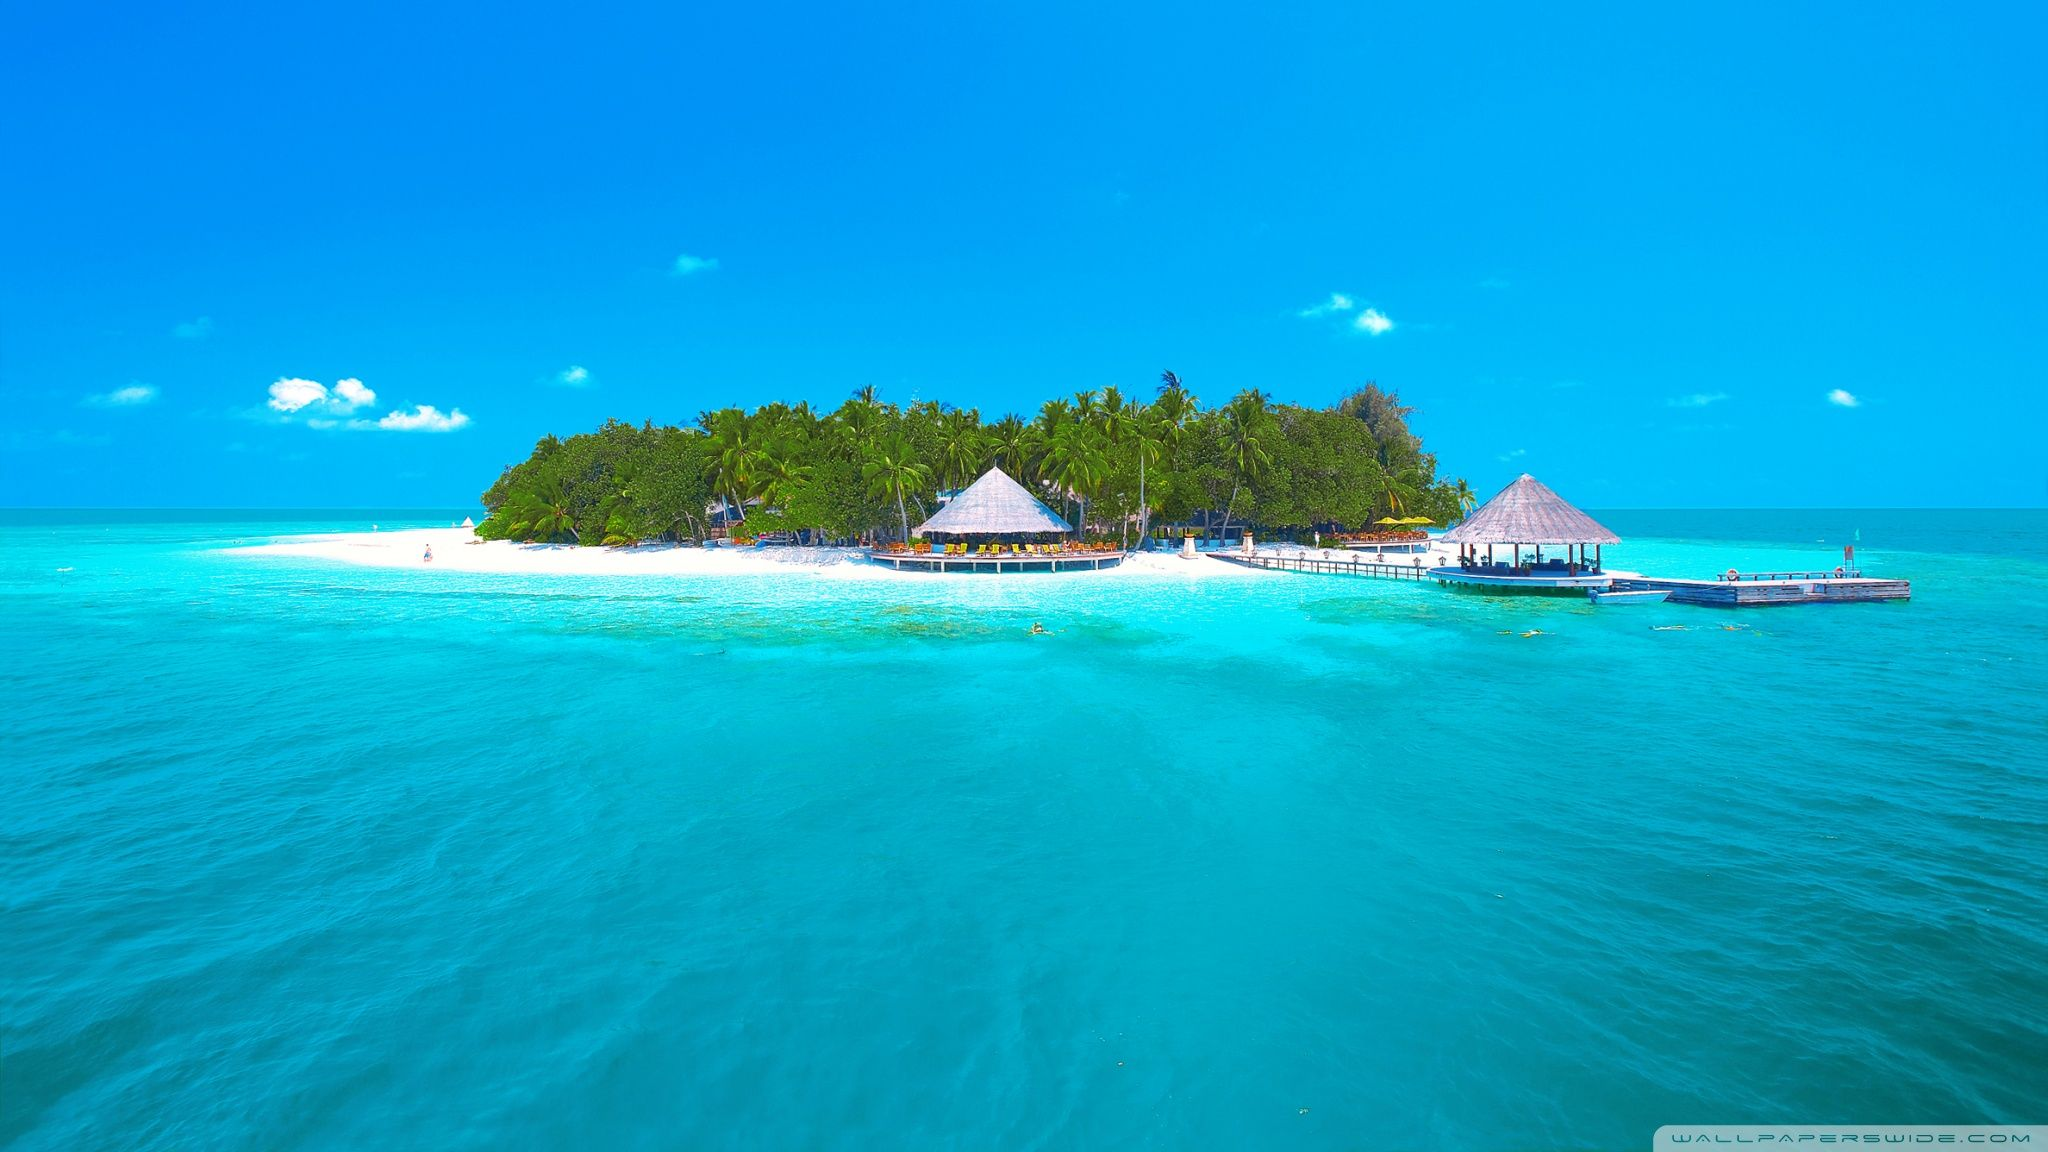 Tropical Paradise Beach 4k Hd Desktop Wallpaper For 4k: Paradise Desktop Wallpapers